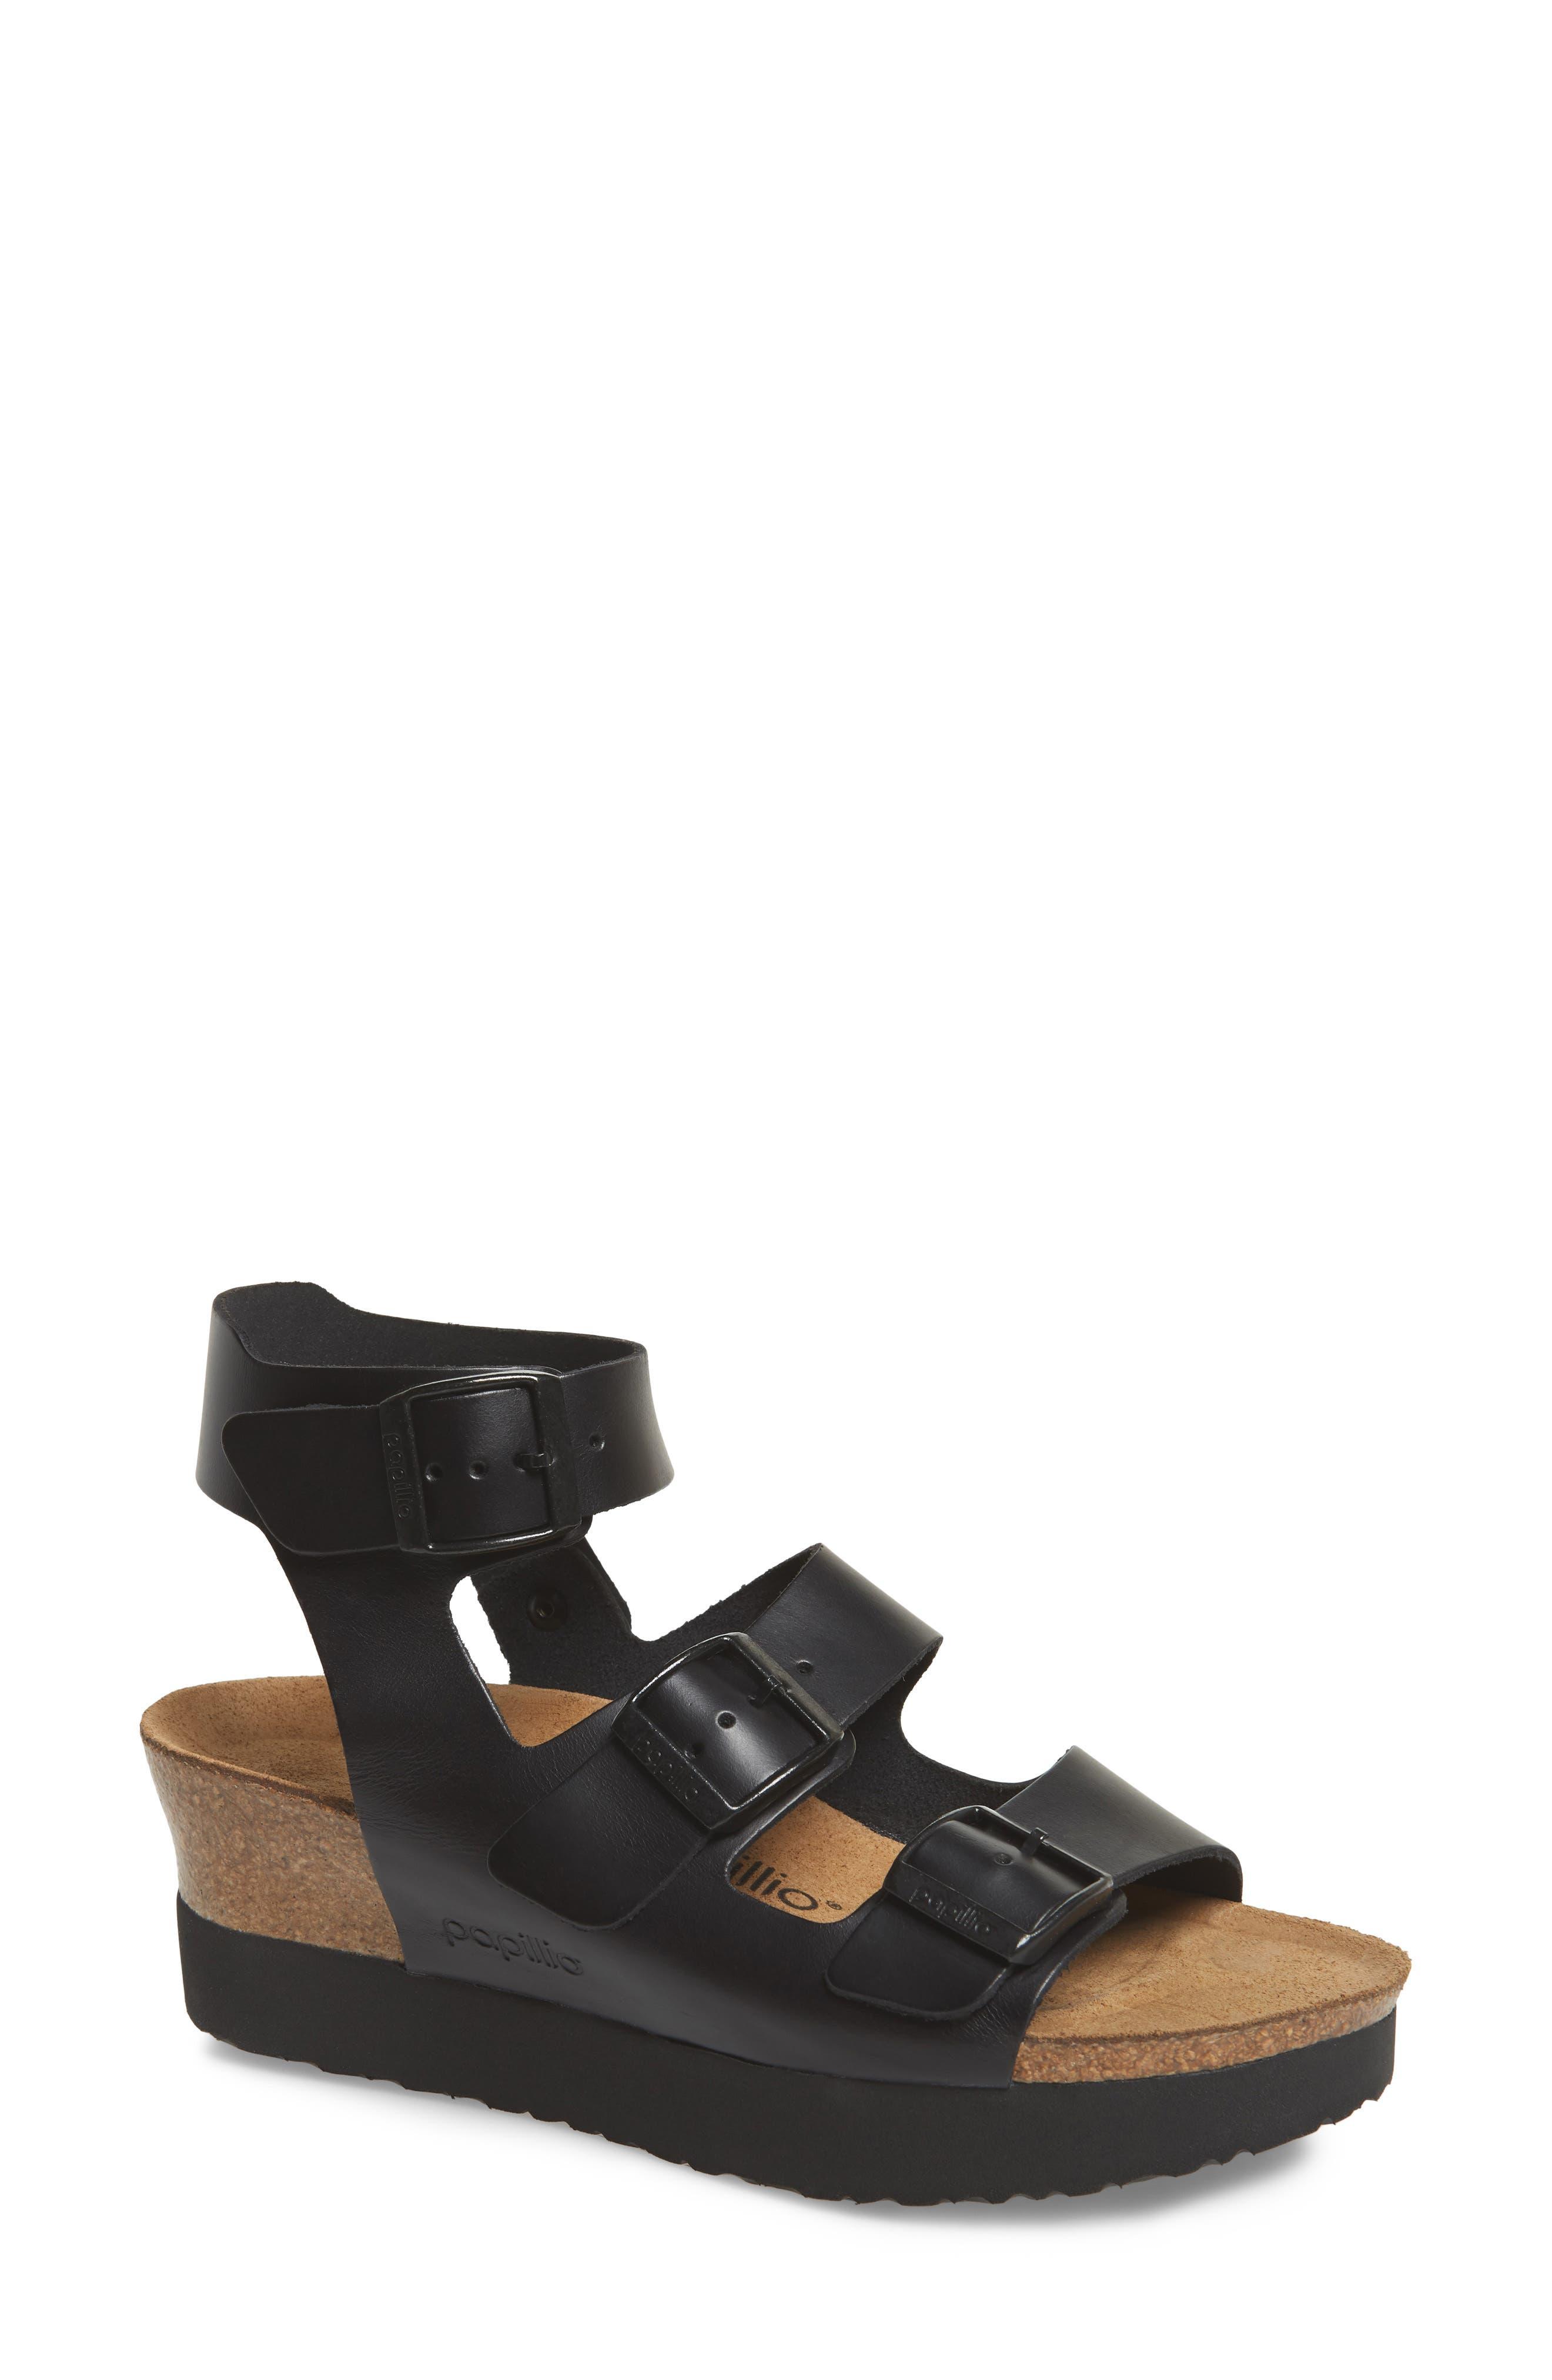 Papillio by Birkenstock Linnea Platform Sandal,                             Main thumbnail 1, color,                             001